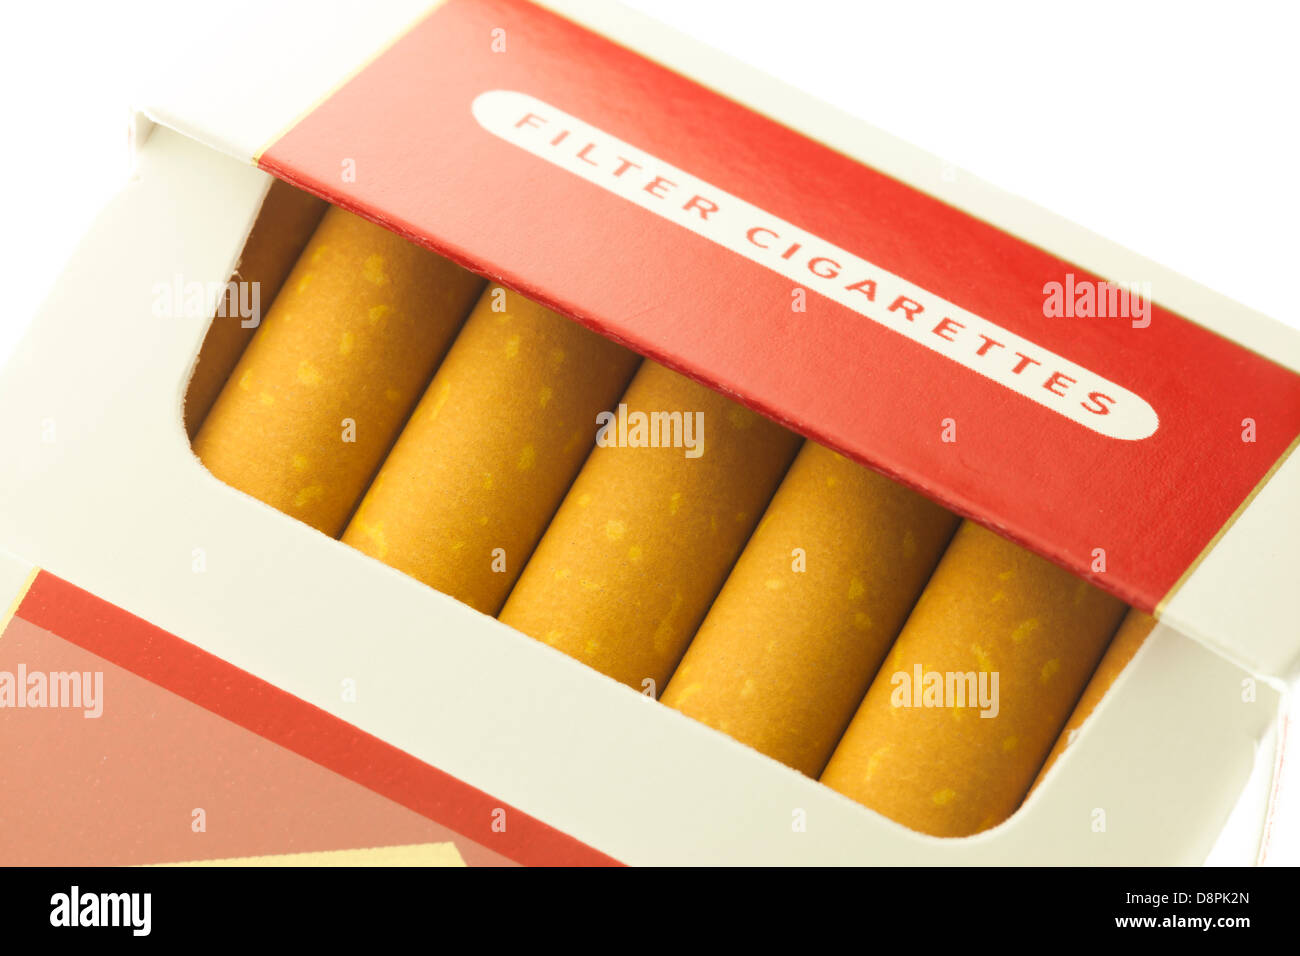 Cheap cigarettes Marlboro free shipping